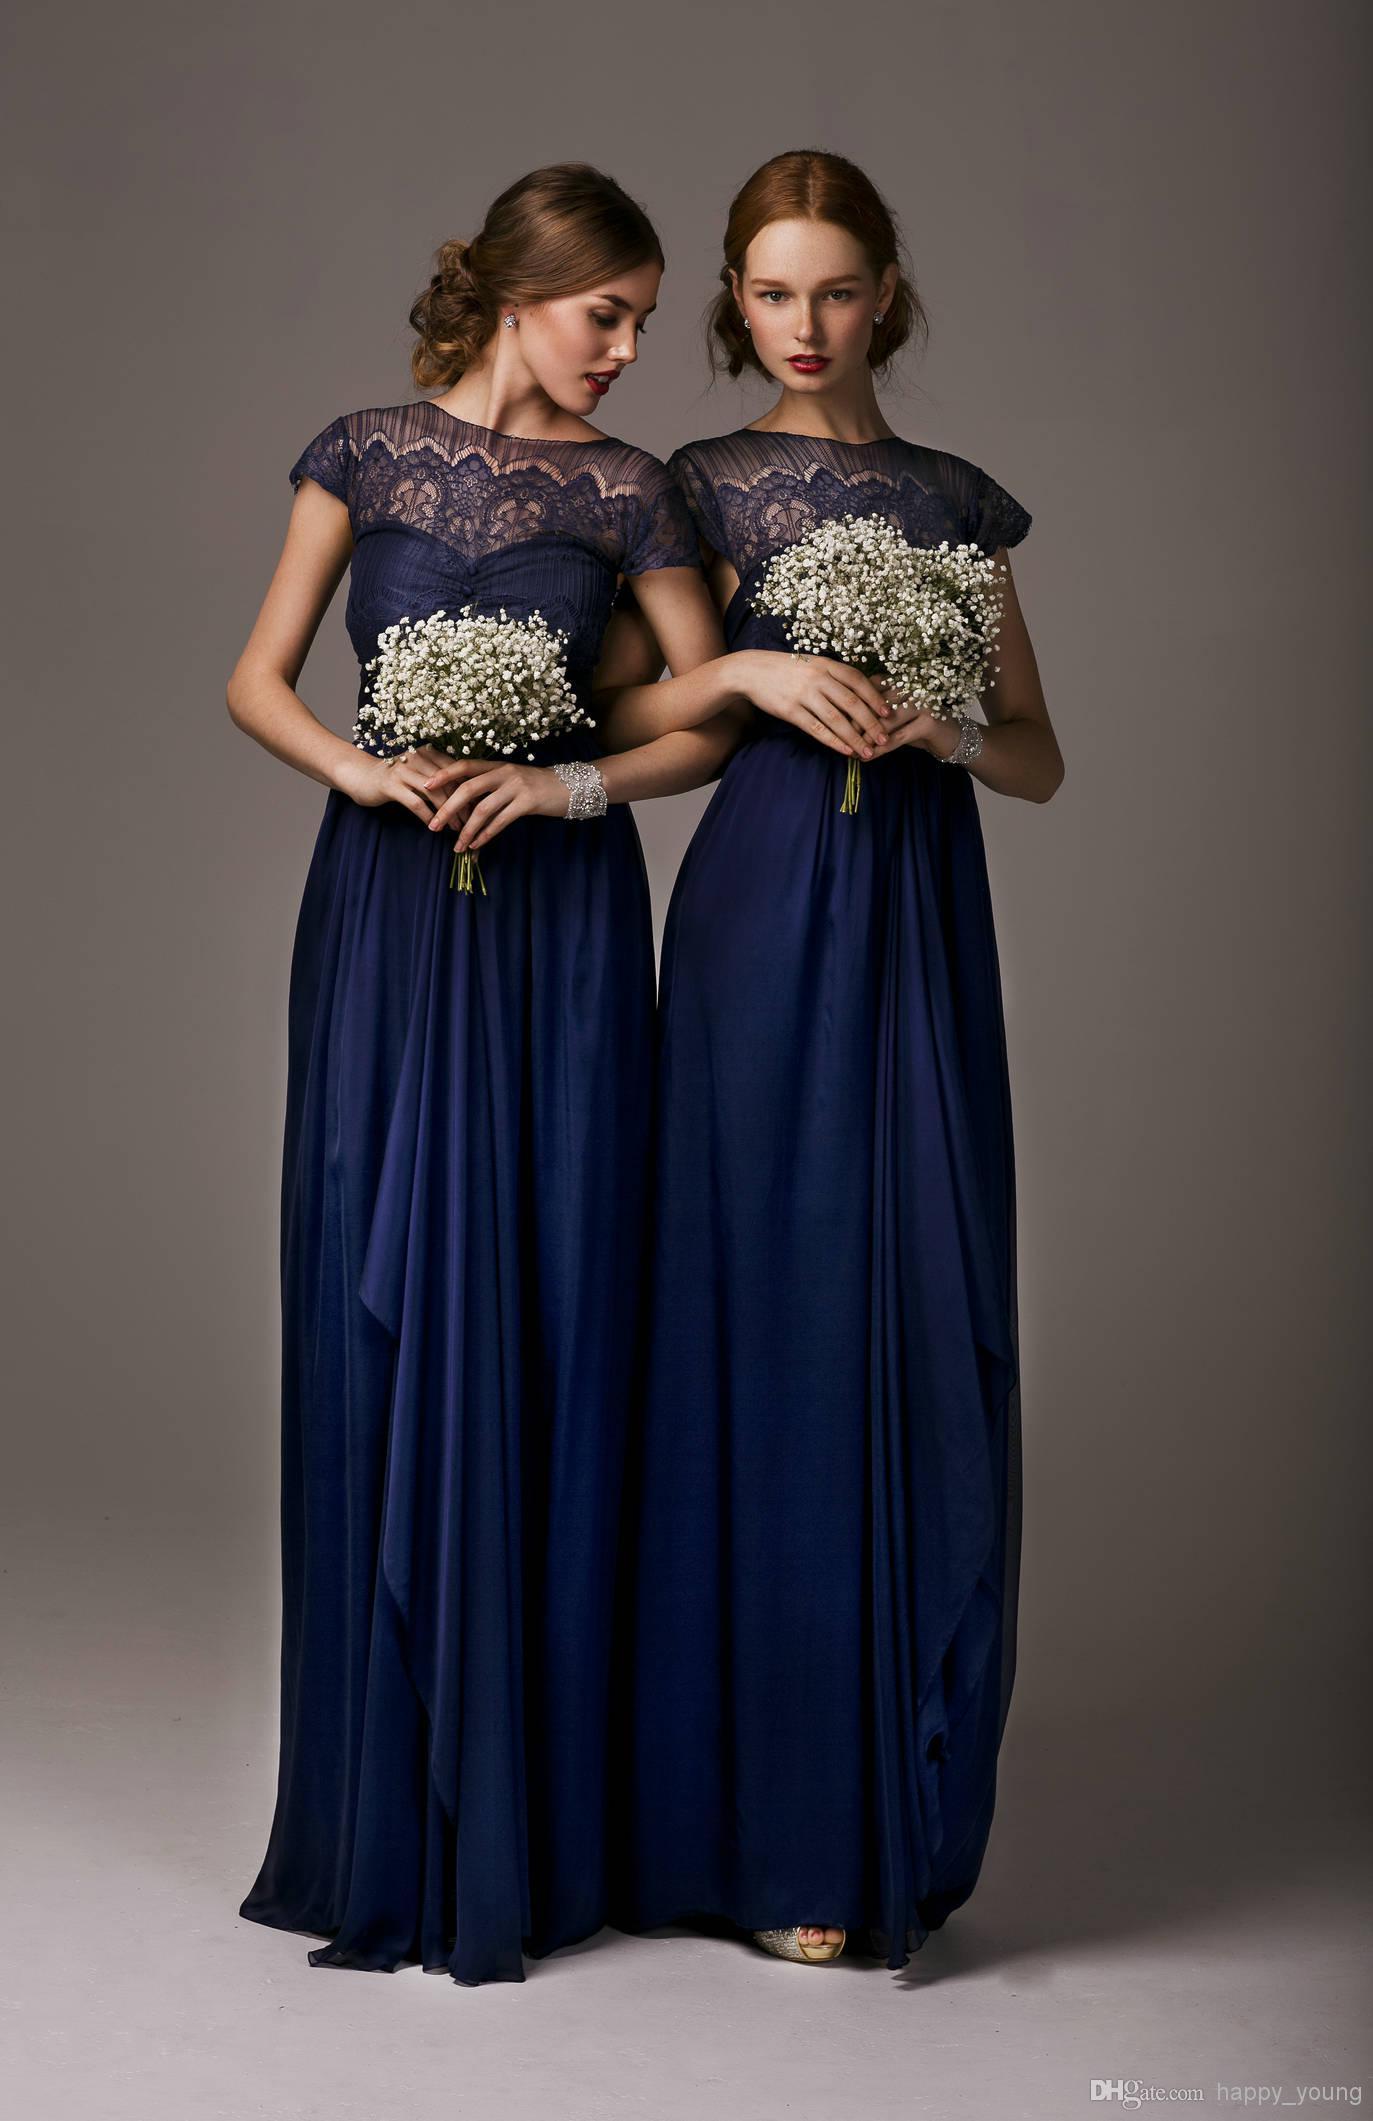 Wedding Dresses and Bridesmaid Dresses Girls Mag